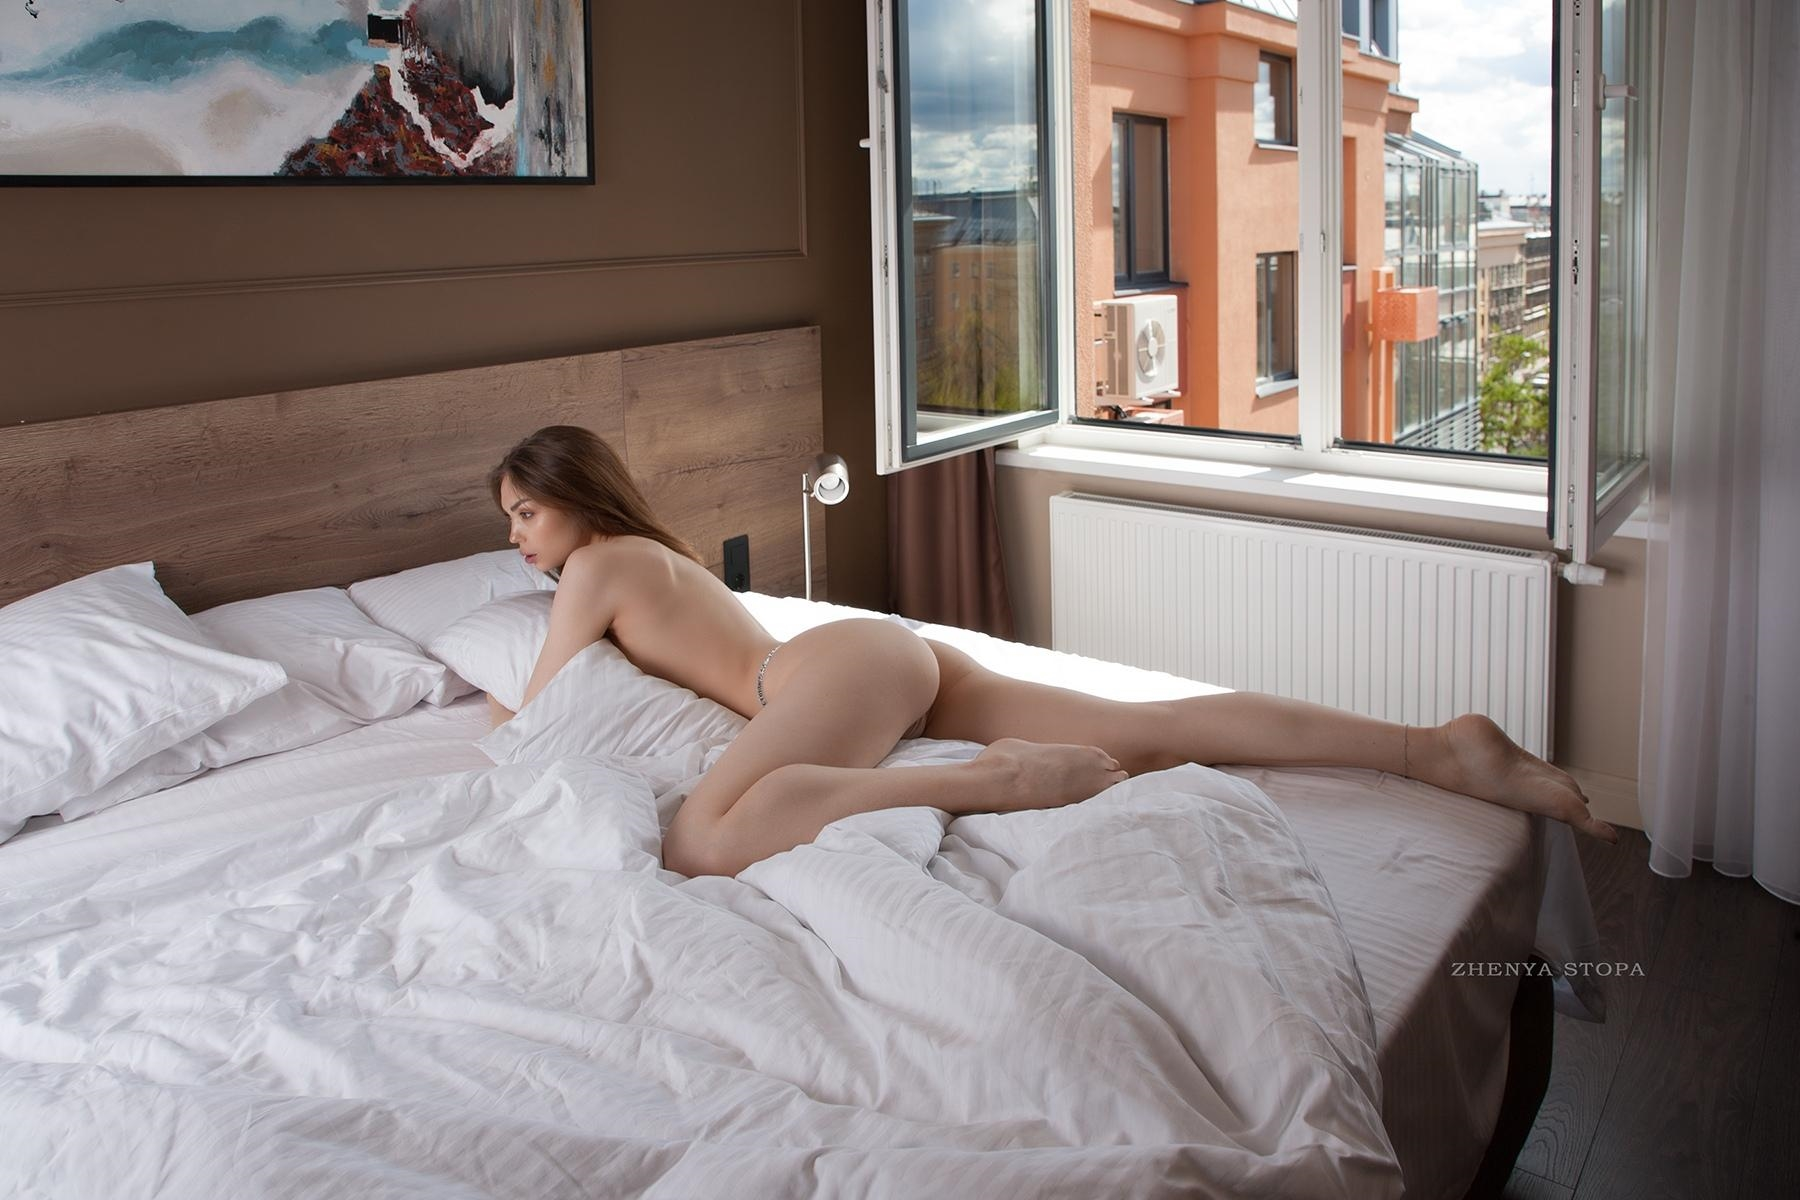 Ekaterina-Kliger-Nude-6-Nudo-Star-com-1